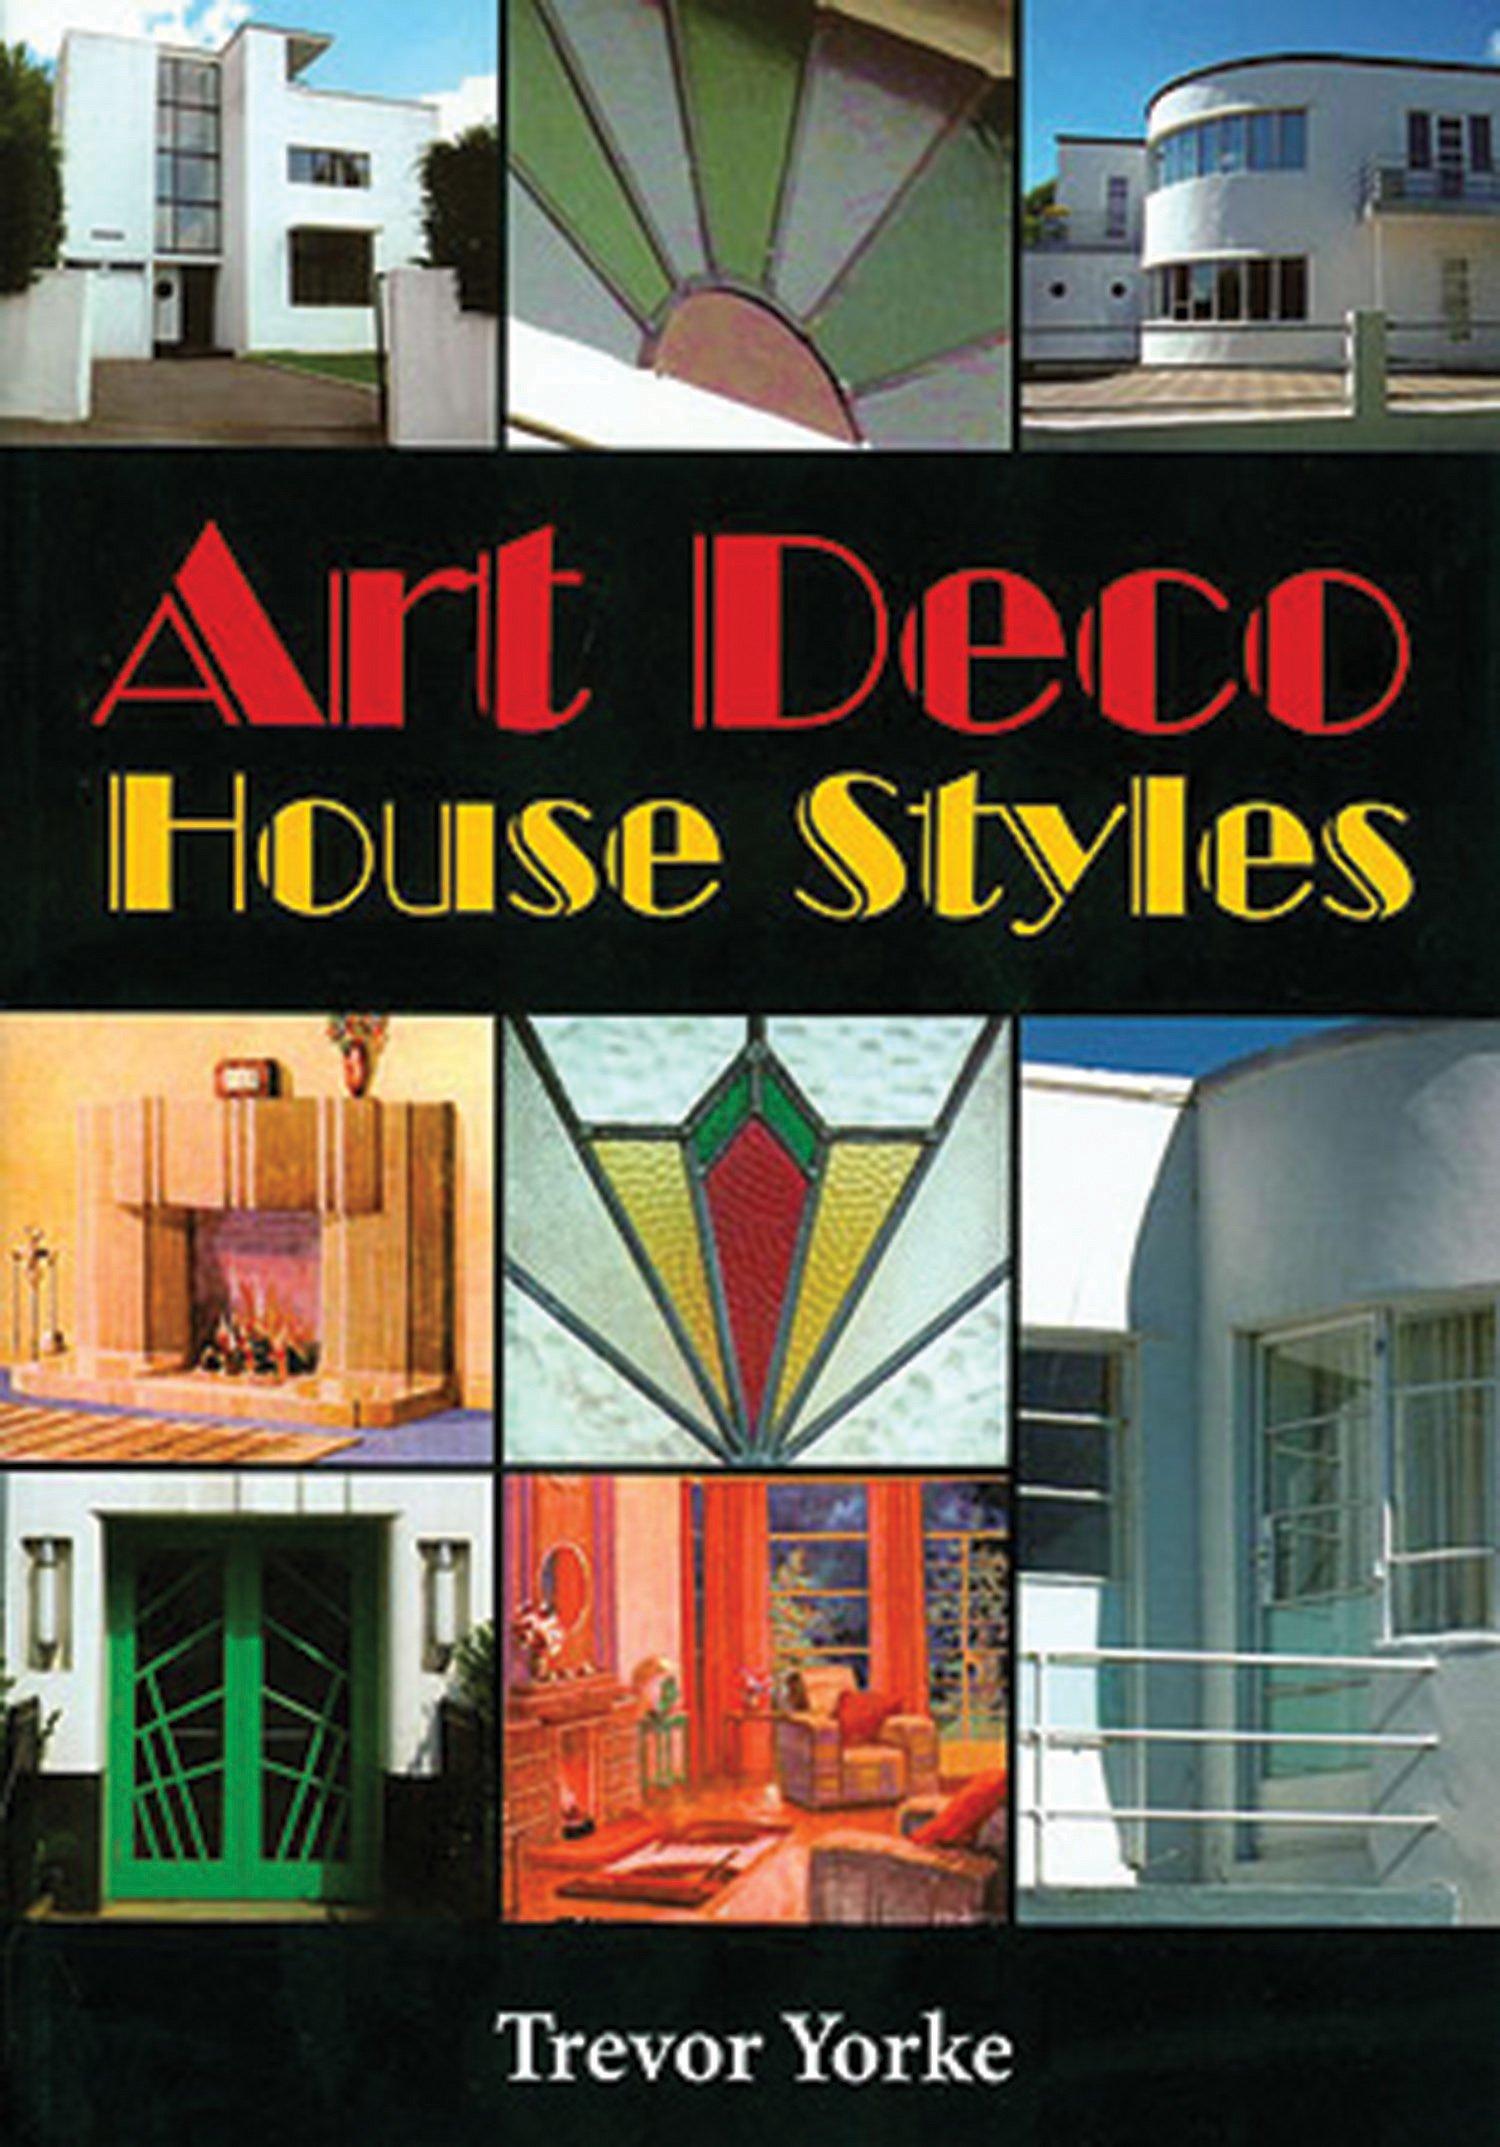 Art Deco House Styles (Britain\'s Living History): Amazon.co.uk ...